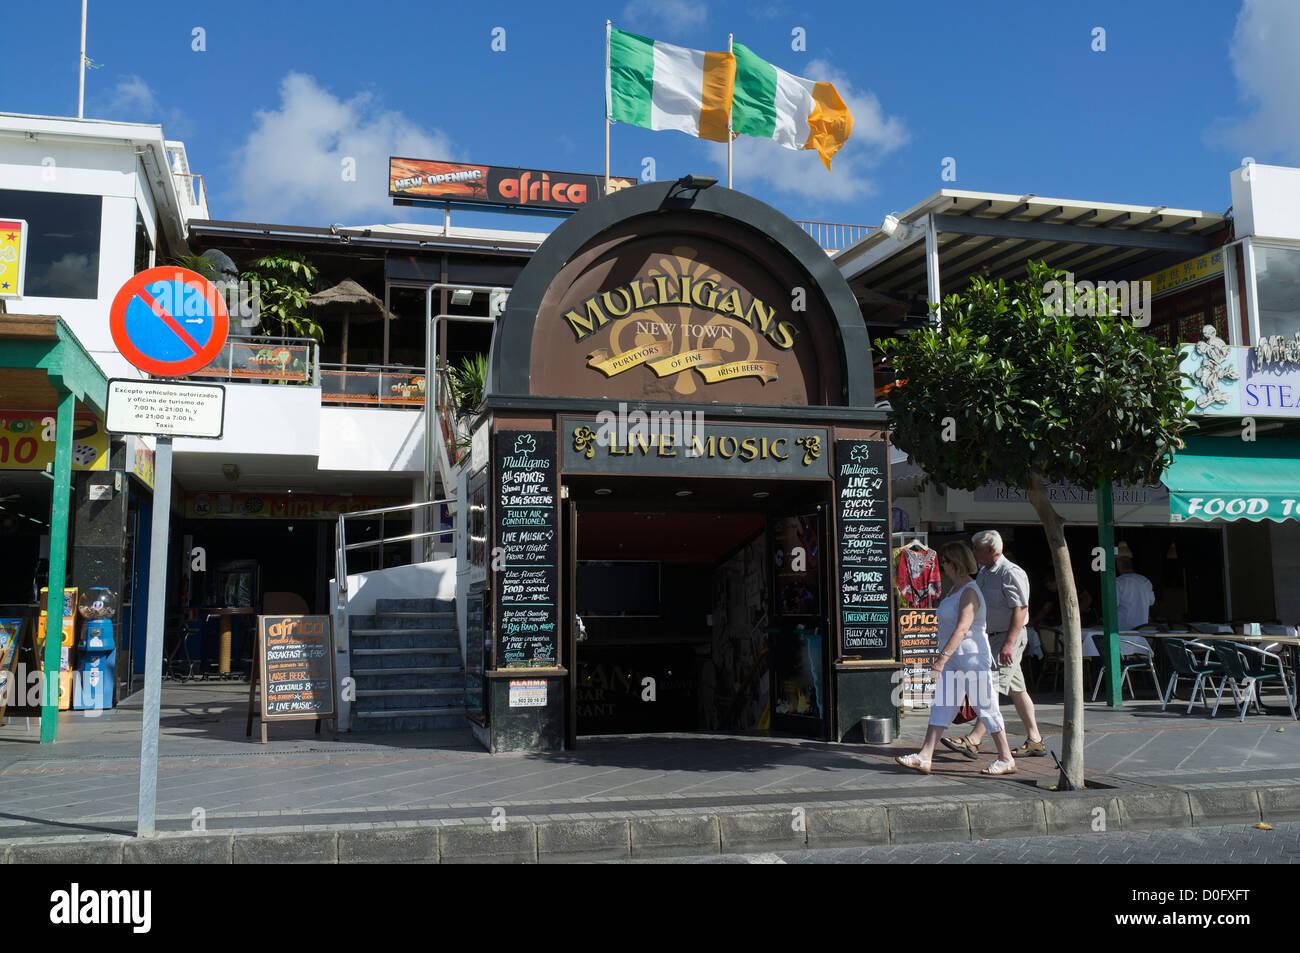 Dh puerto del carmen lanzarote tourist walking passed irish stock photo royalty free image - Lanzarote walks from puerto del carmen ...